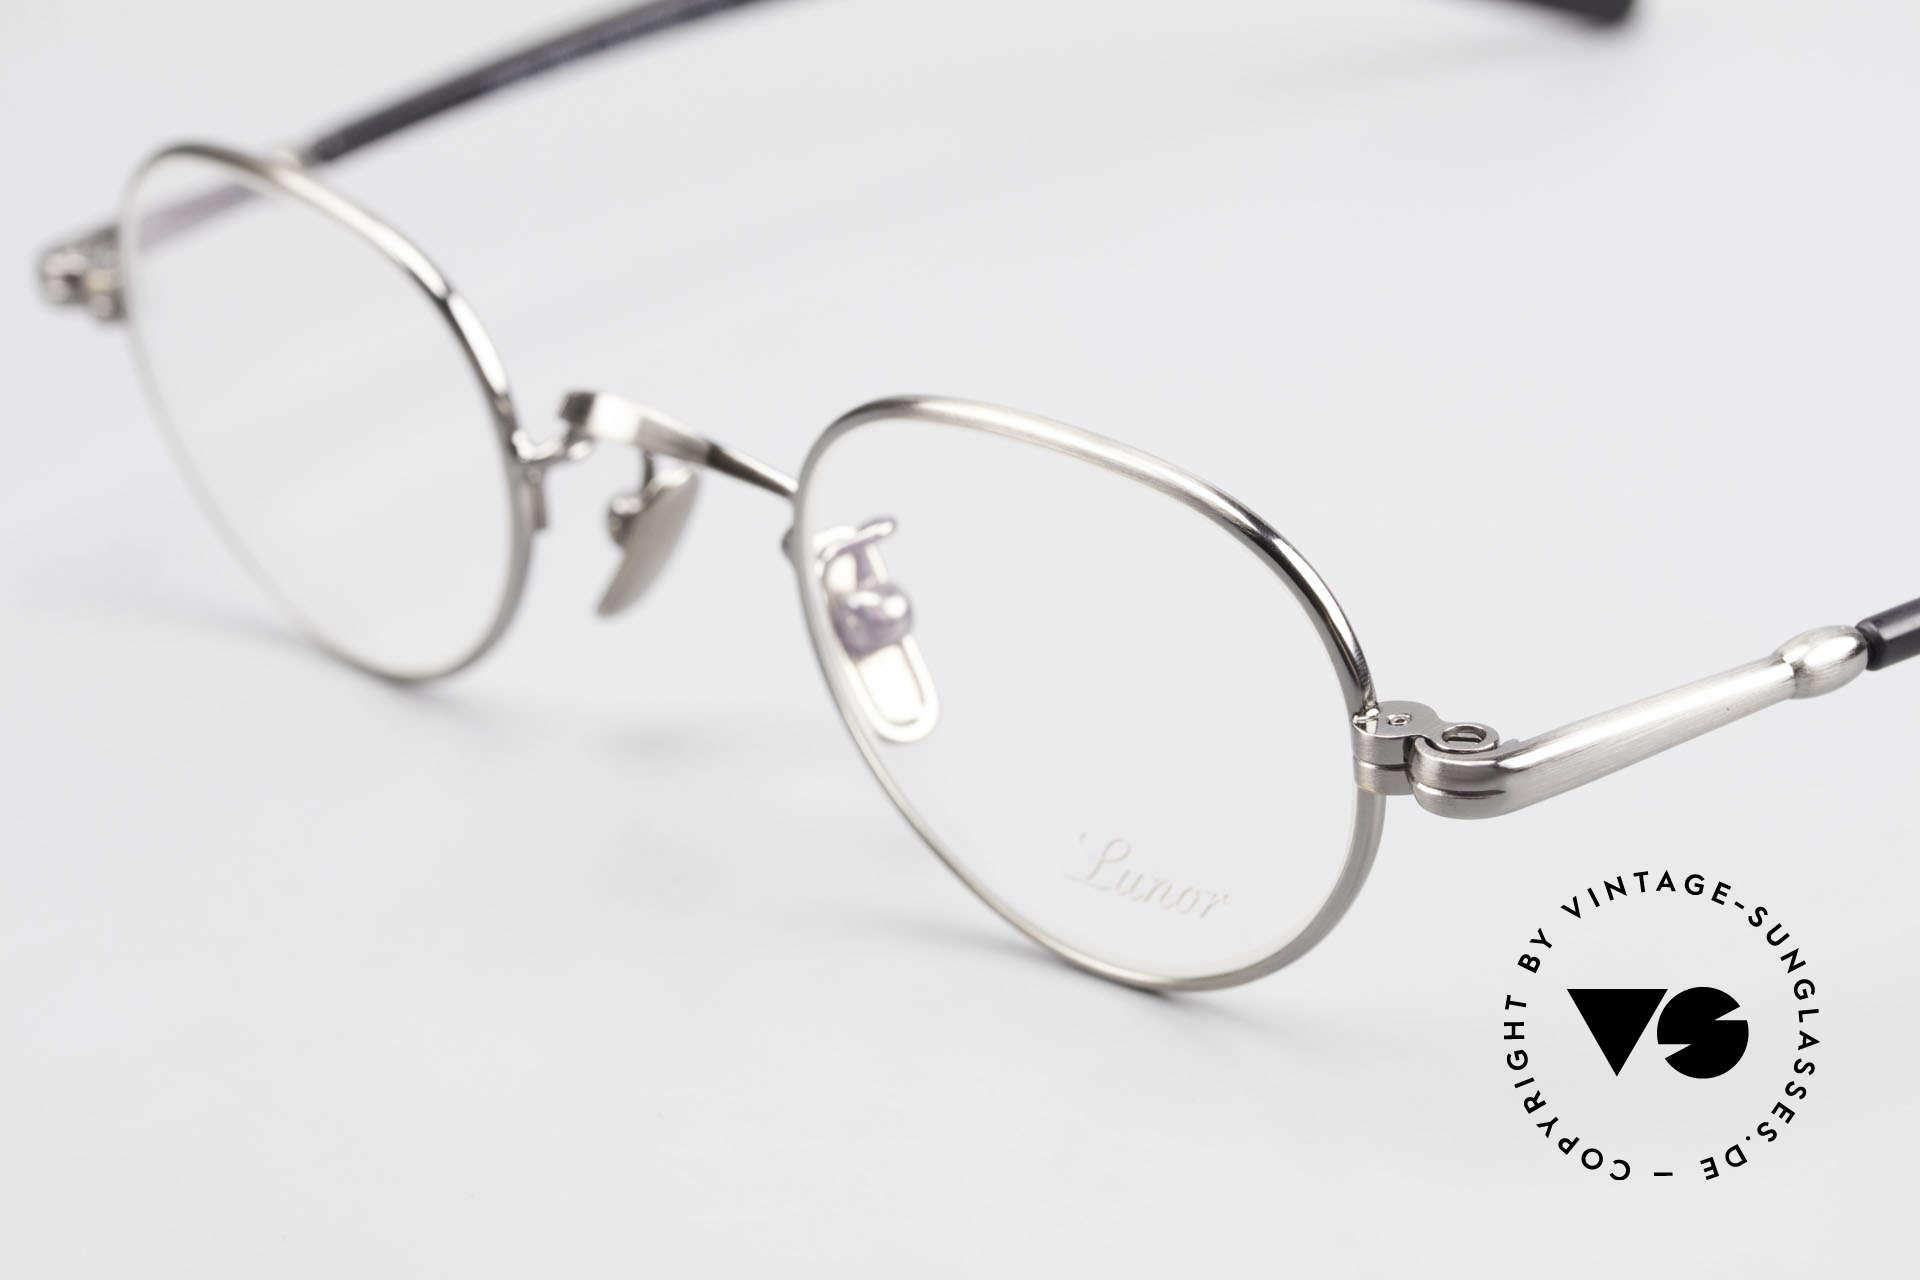 Lunor VA 103 Old Lunor Eyeglasses Vintage, model VA 103 = acetate-metal temples & titanium pads, Made for Men and Women